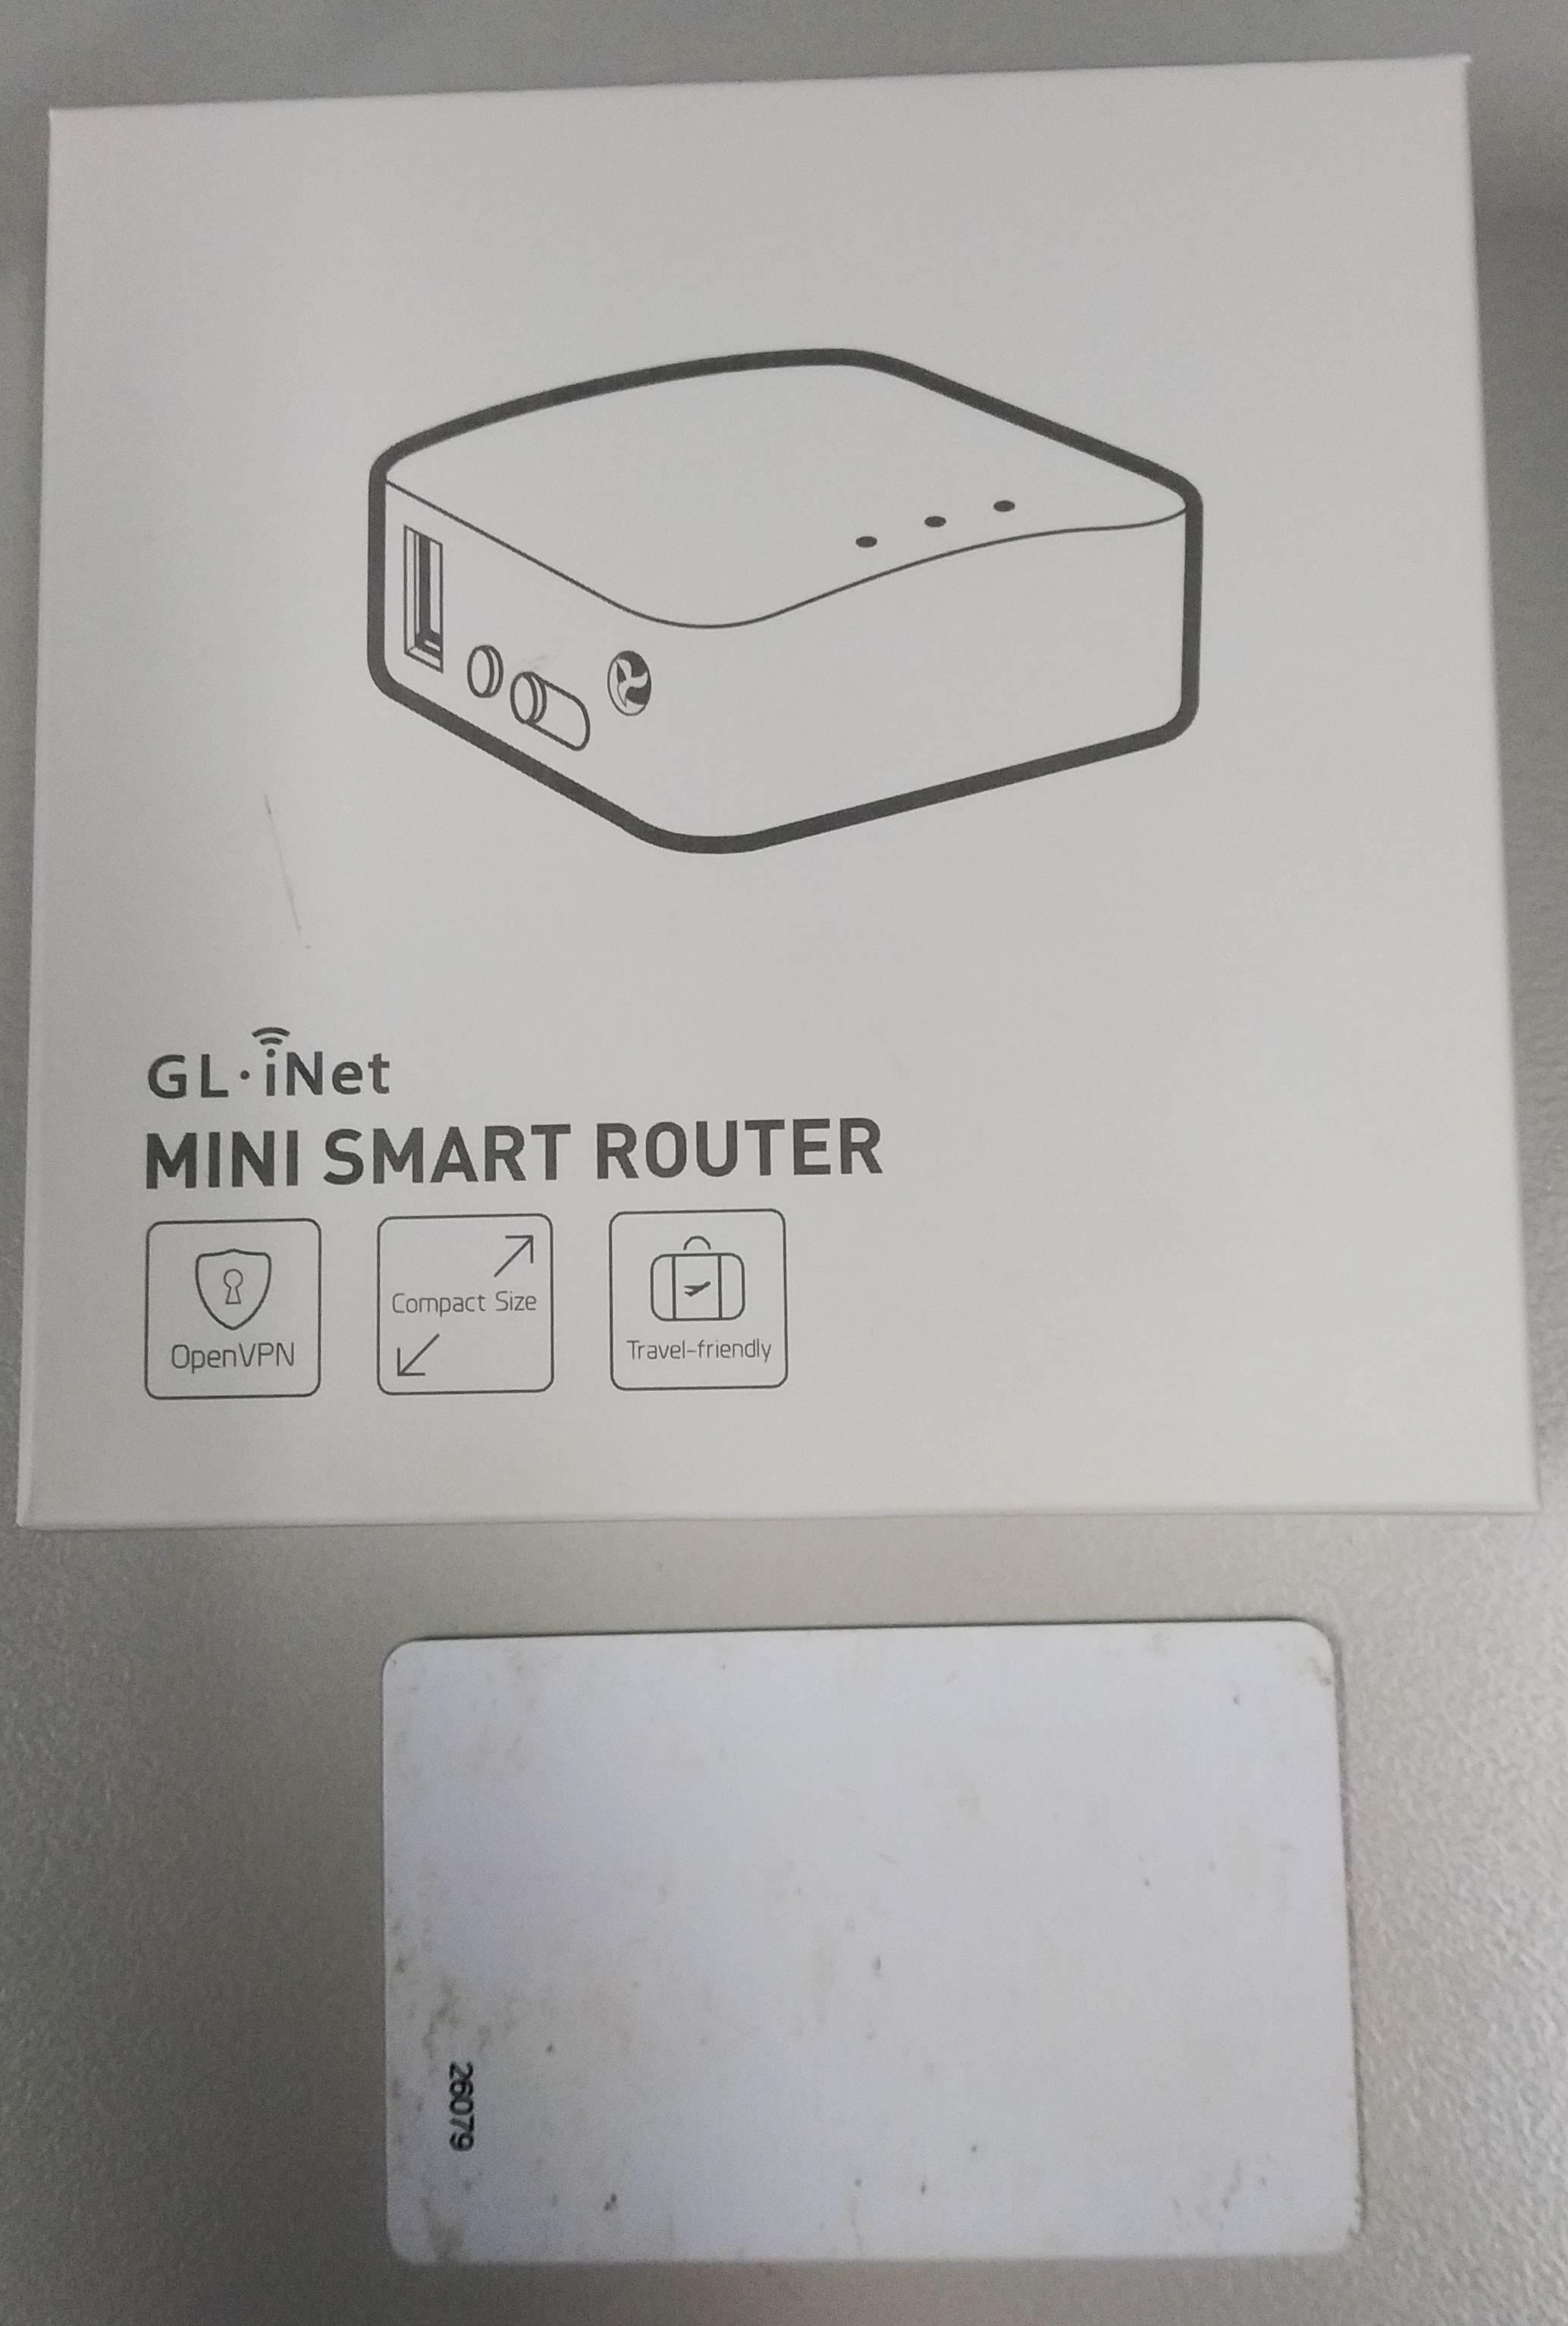 GL iNet GL-MT300N-V2 (Mango) mini travel router review – The Gadgeteer